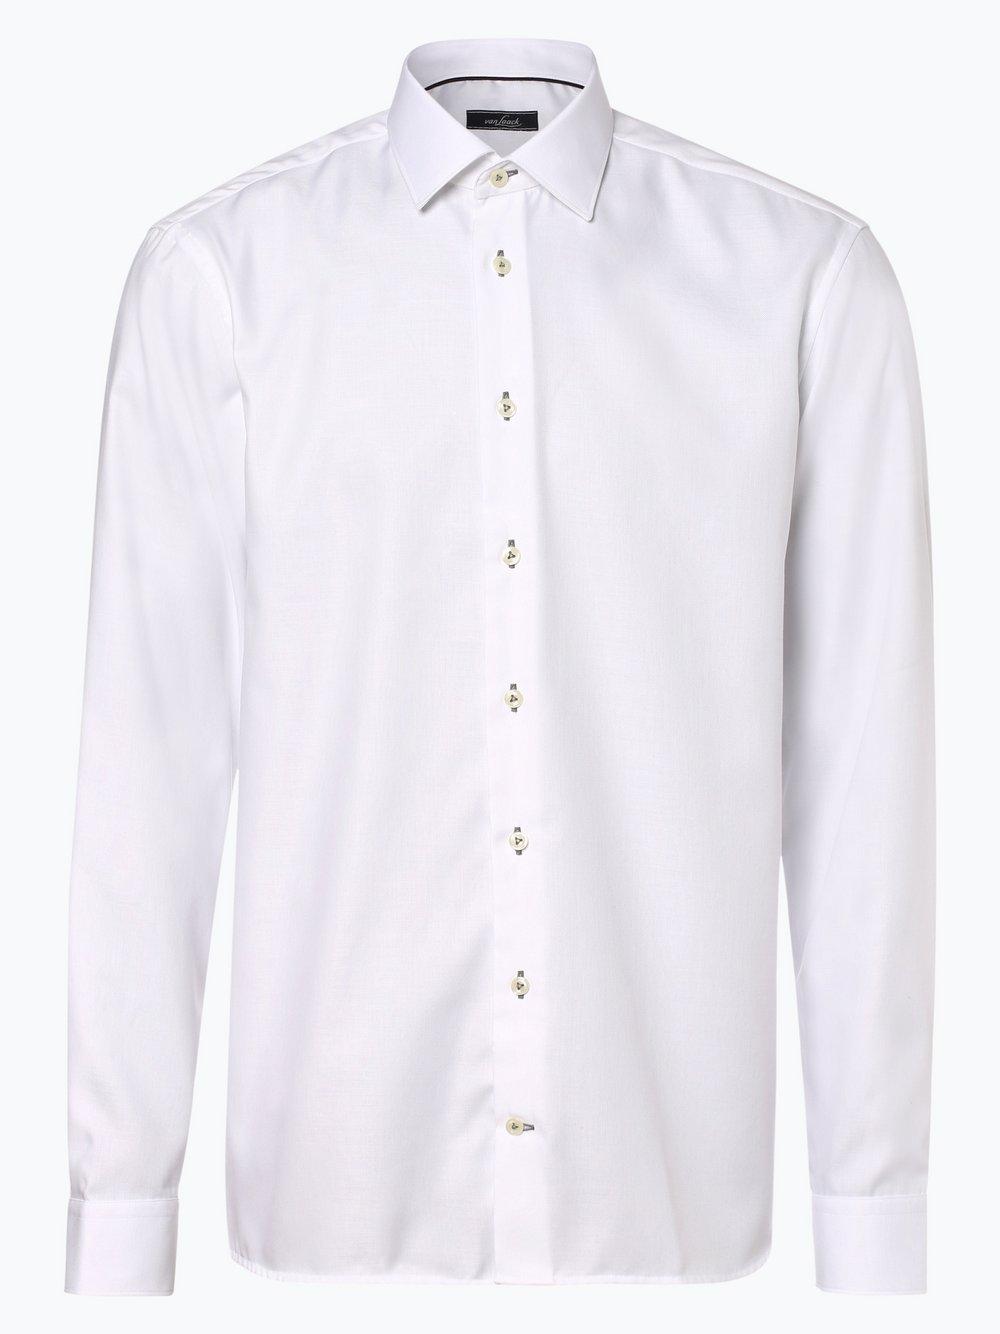 Van Laack – Koszula męska, biały Van Graaf 447010-0001-00400